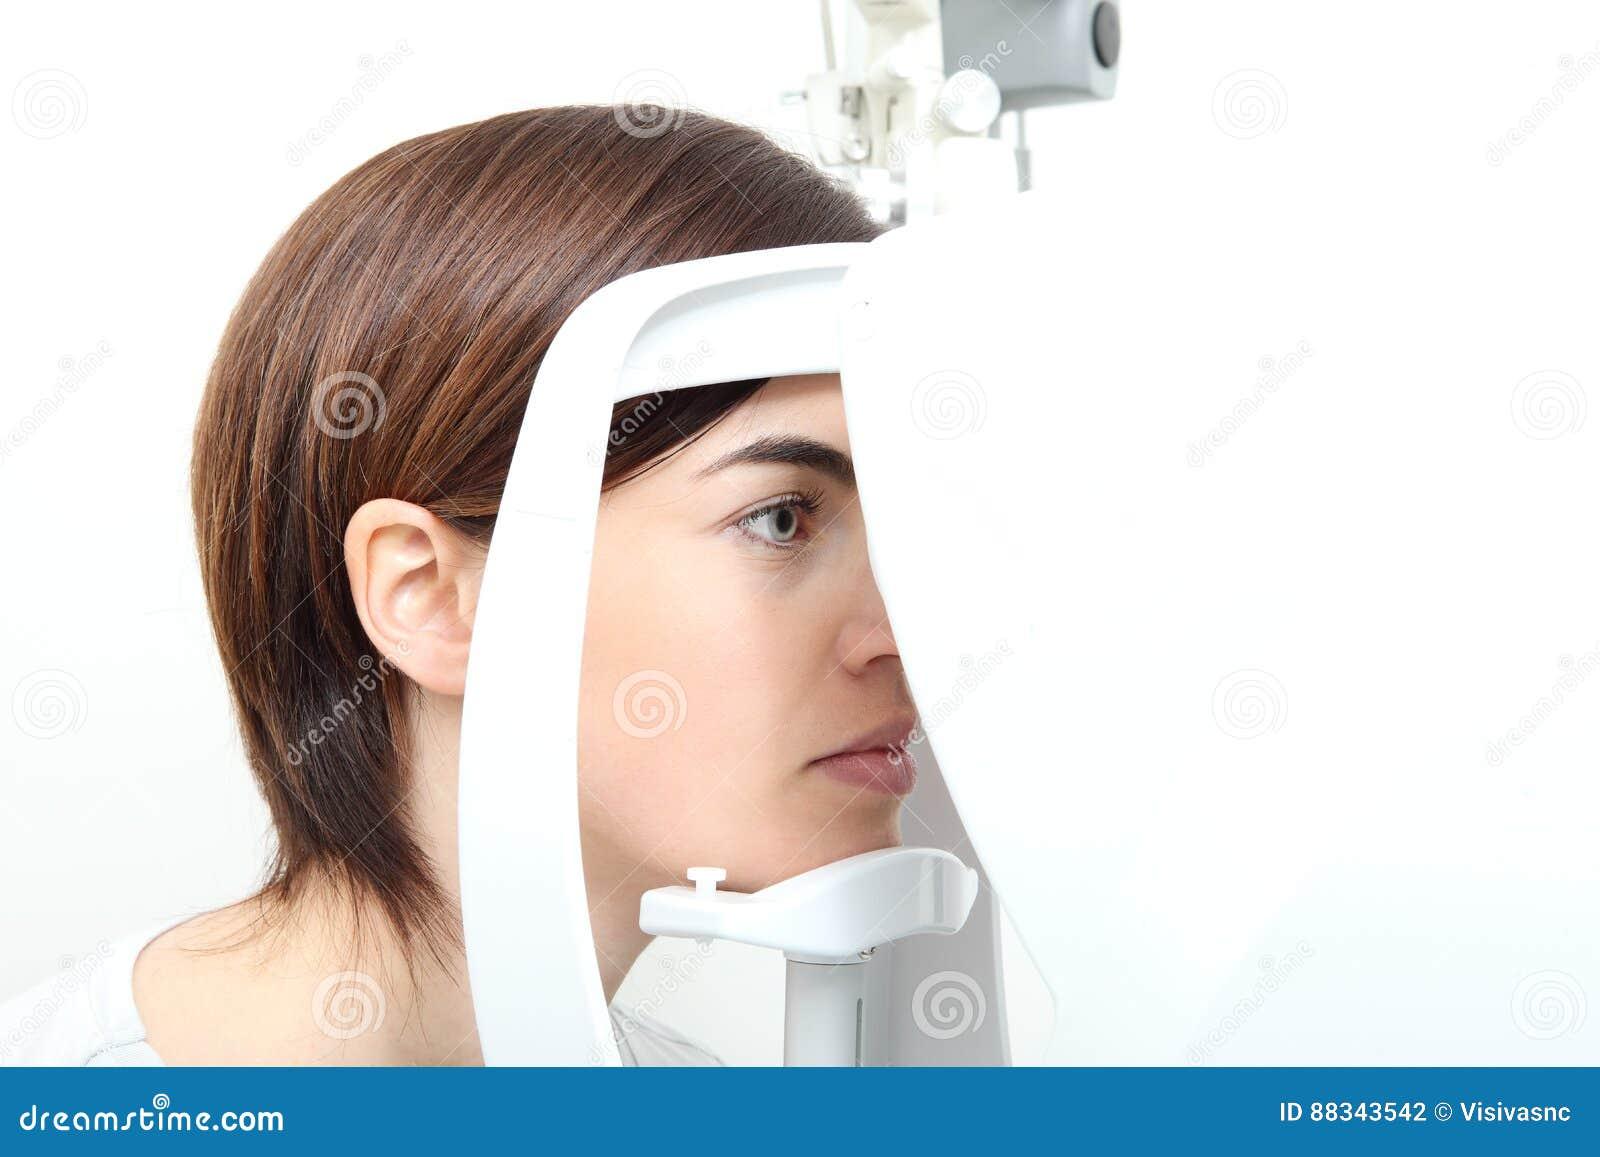 1f892b8616 Γυναίκα που κάνει τη μέτρηση όρασης με τον οπτικό λαμπτήρα Στοκ ...